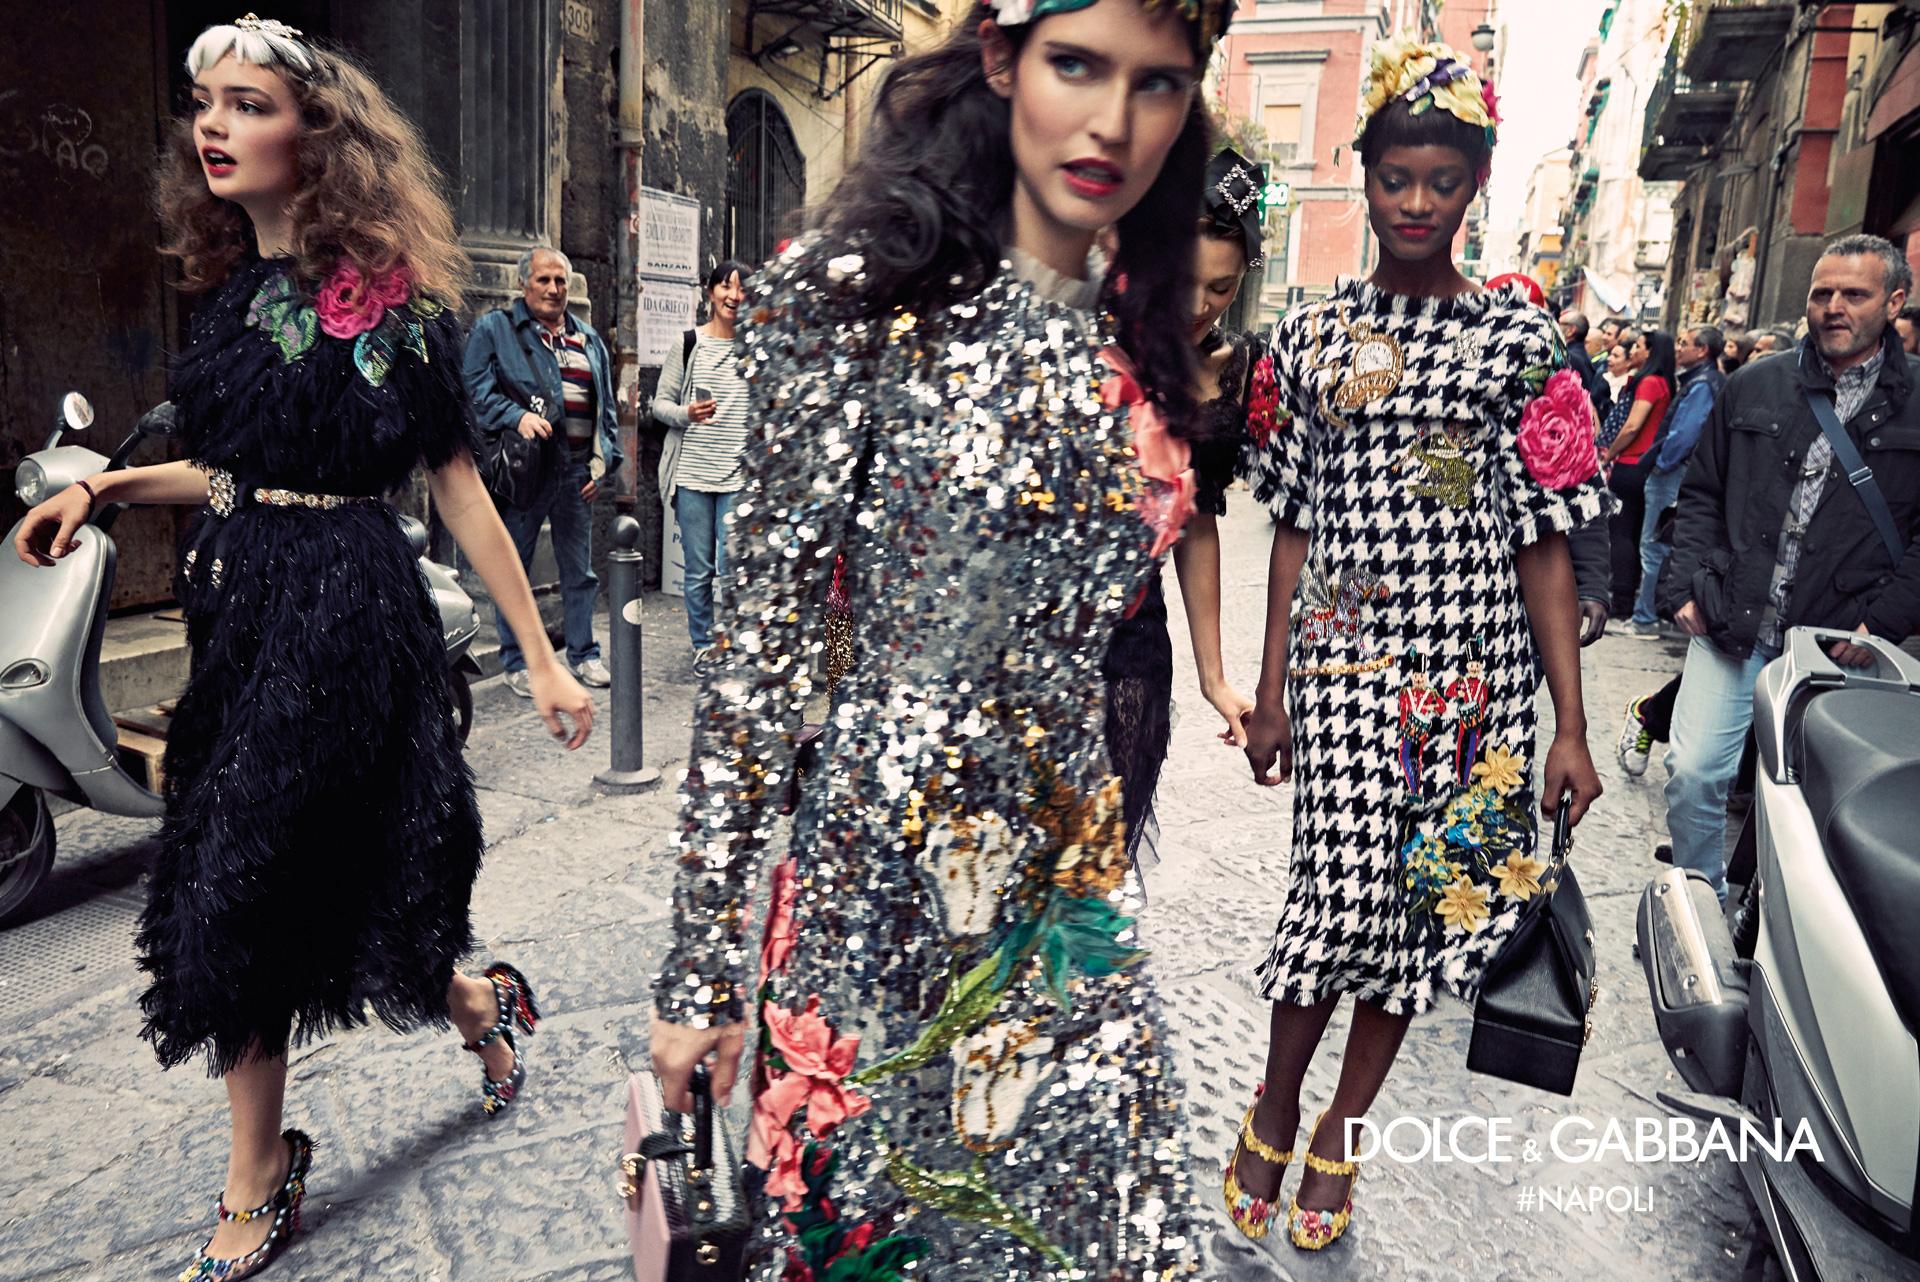 Dolce-Gabbana-Fall-Winter-2016-2017-Ad-Campaign-Naples-4